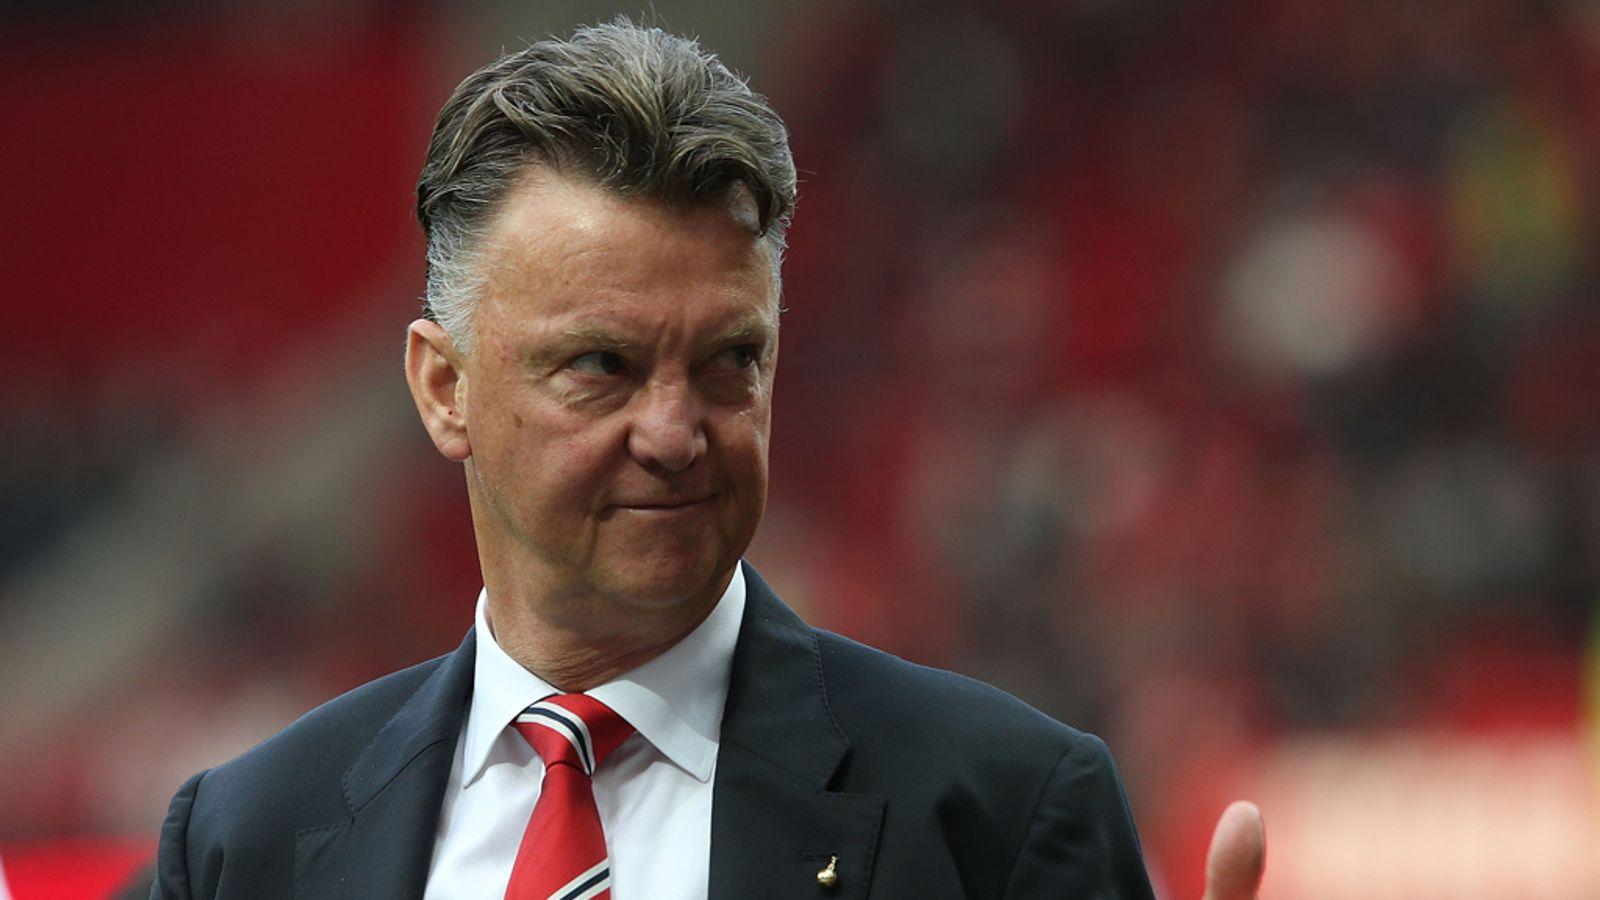 Premier League: Louis Van Gaal Pleased With Manchester